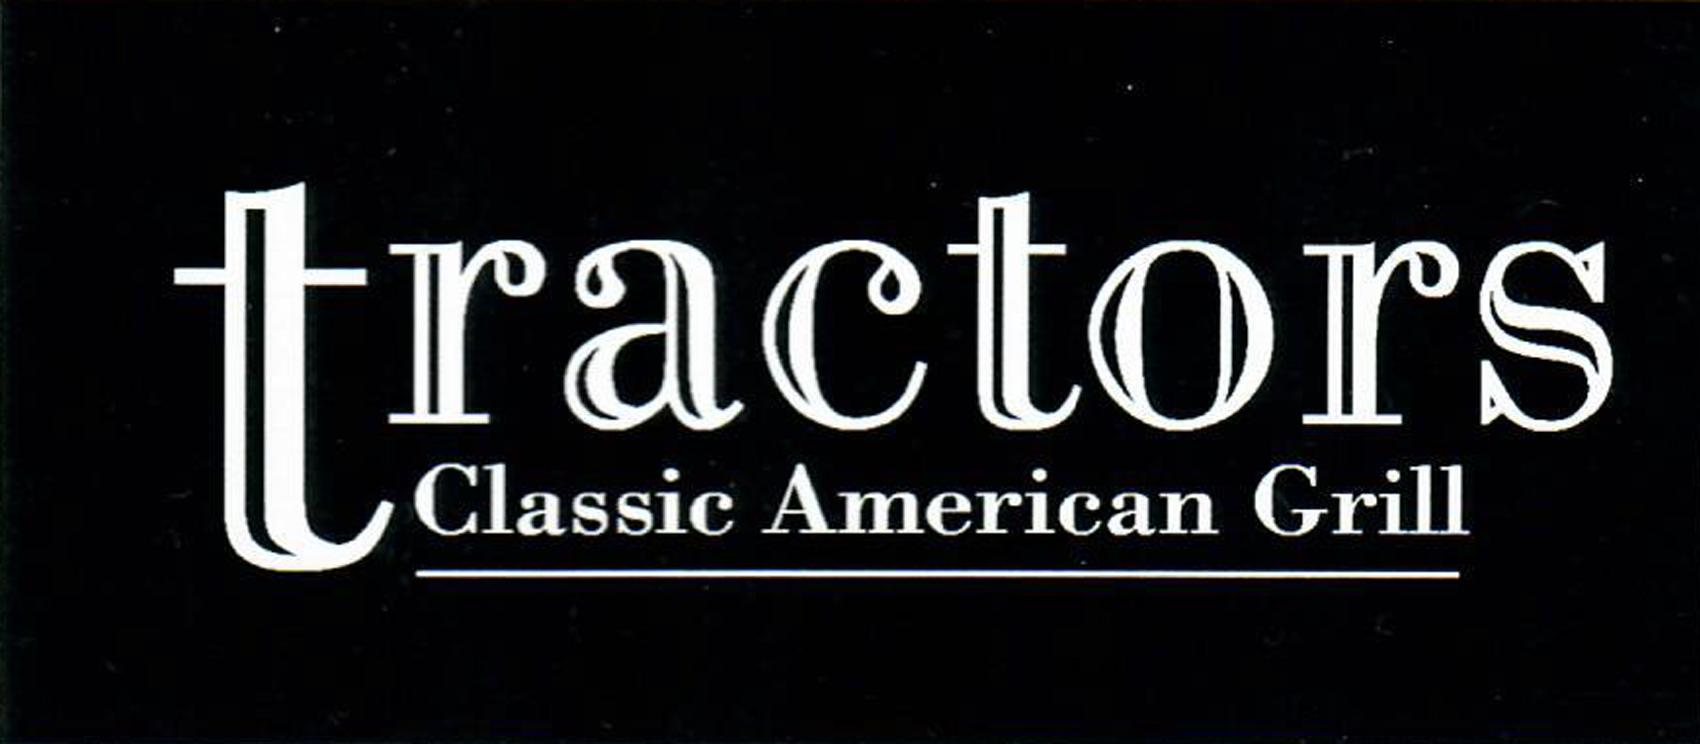 Tractors Classic American Grill